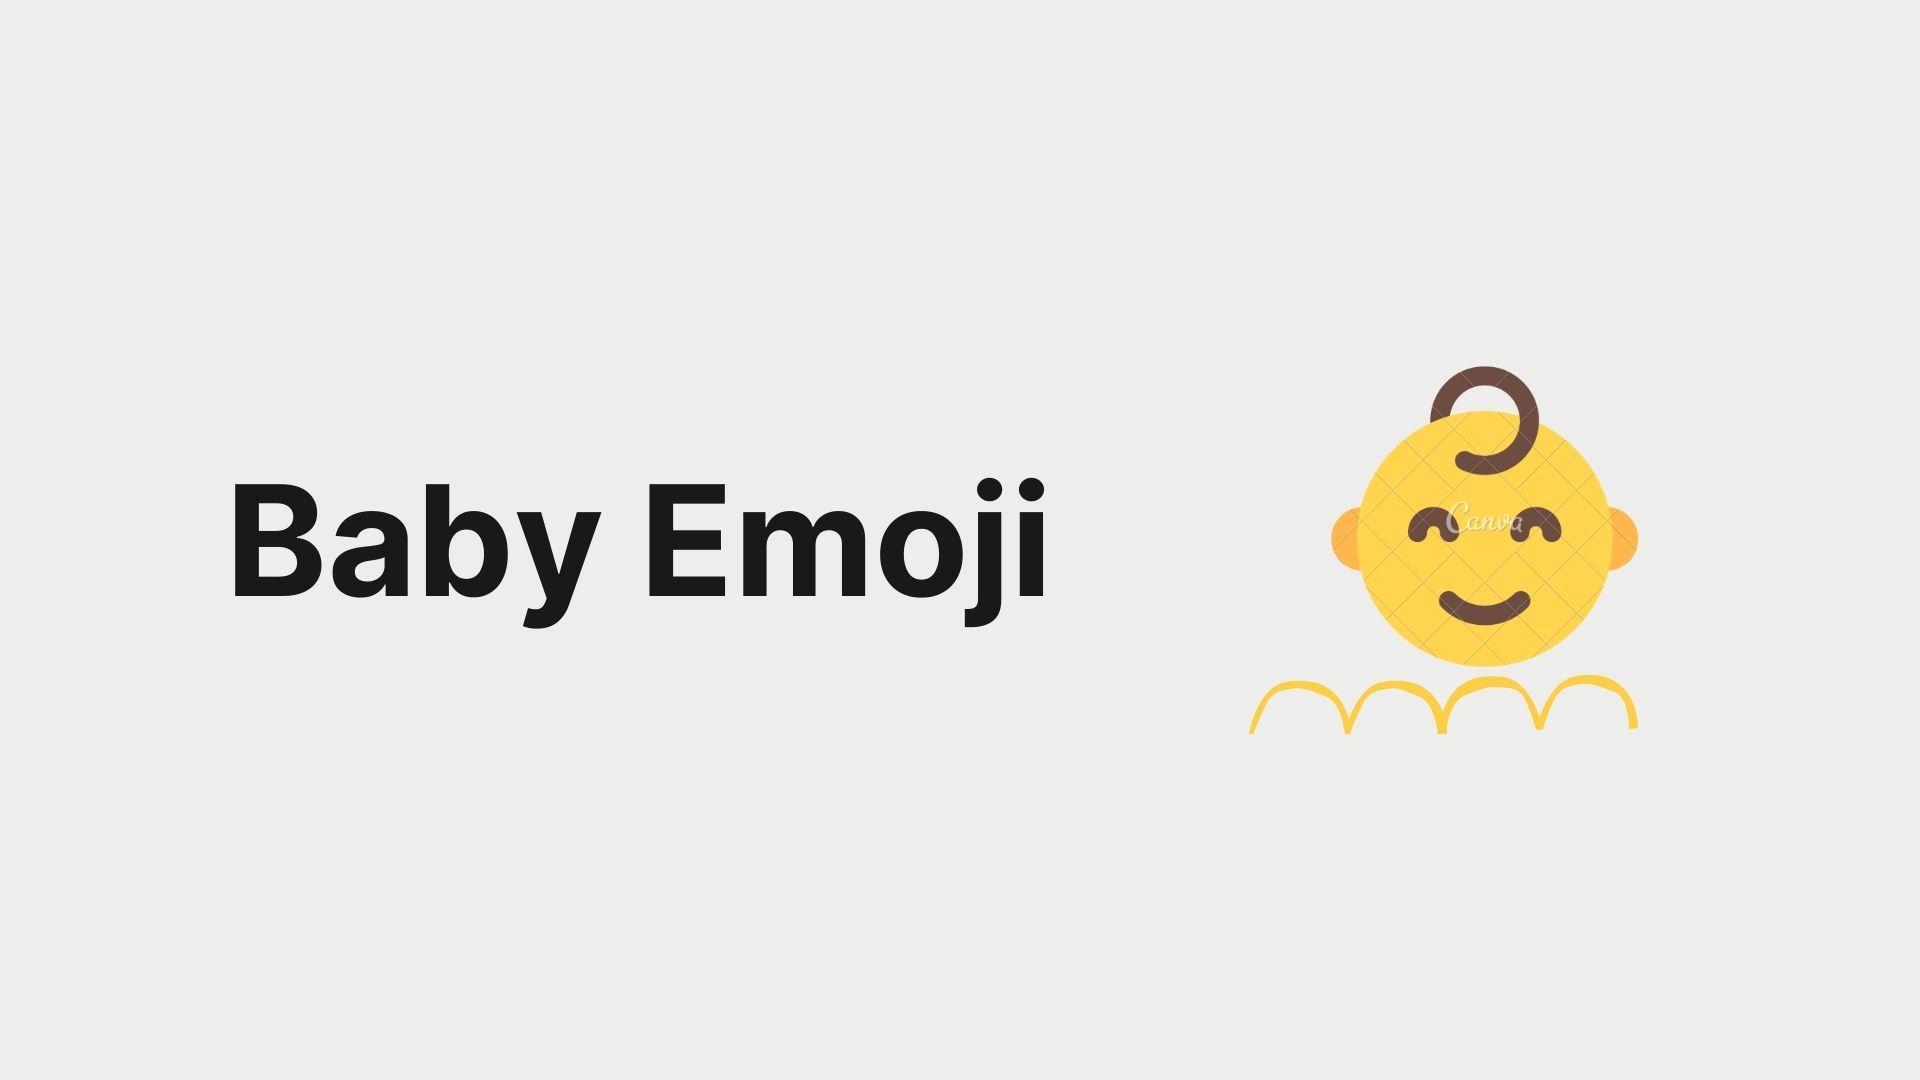 Baby Emoji